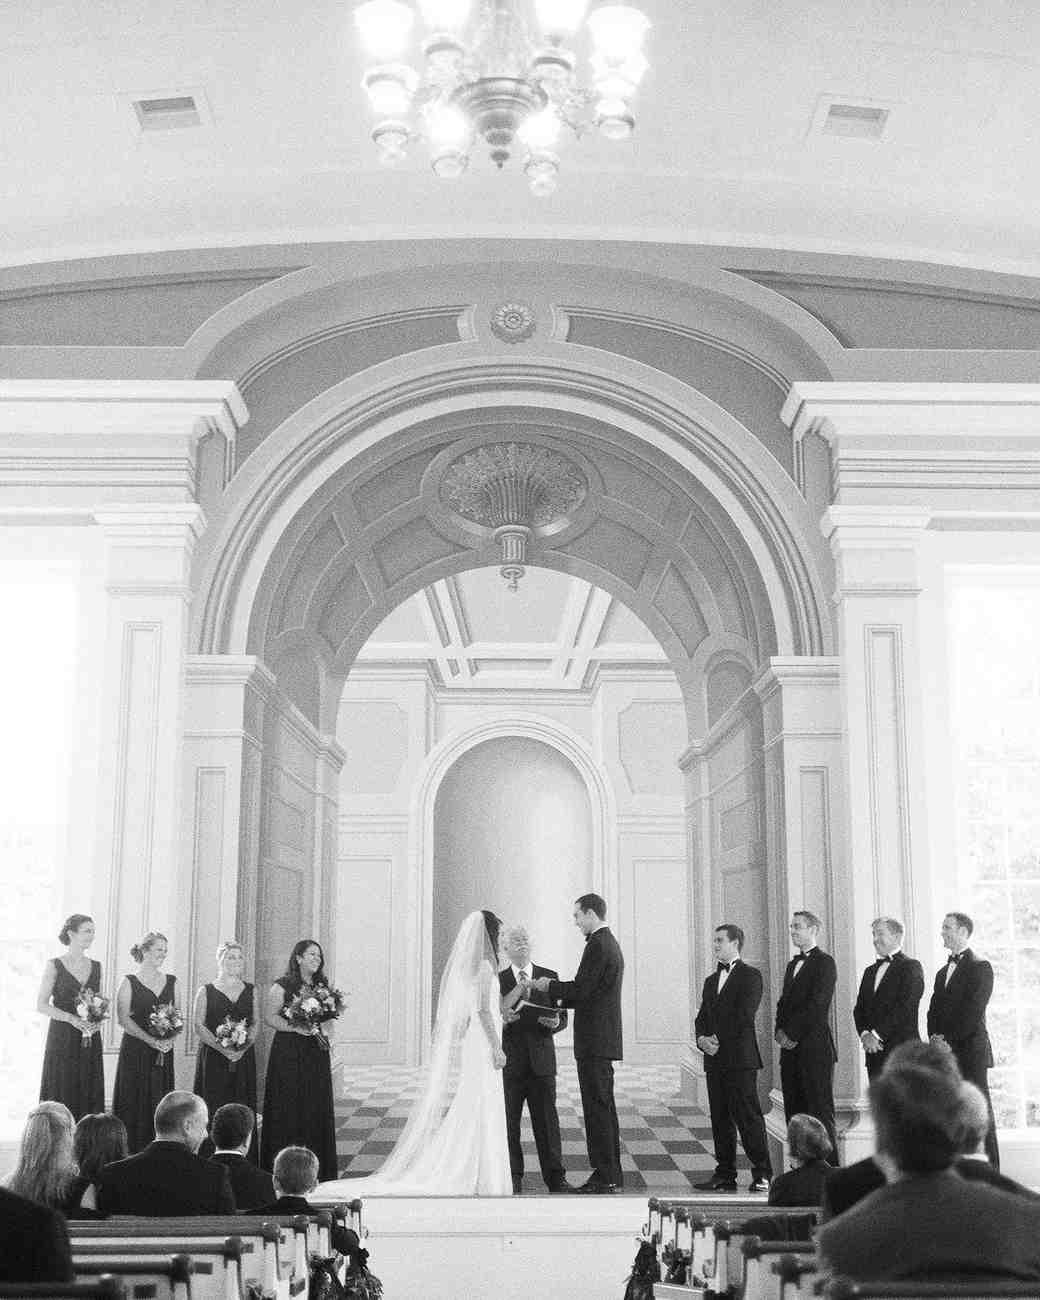 lindsay-garrett-wedding-ceremony-0540-s111850-0415.jpg